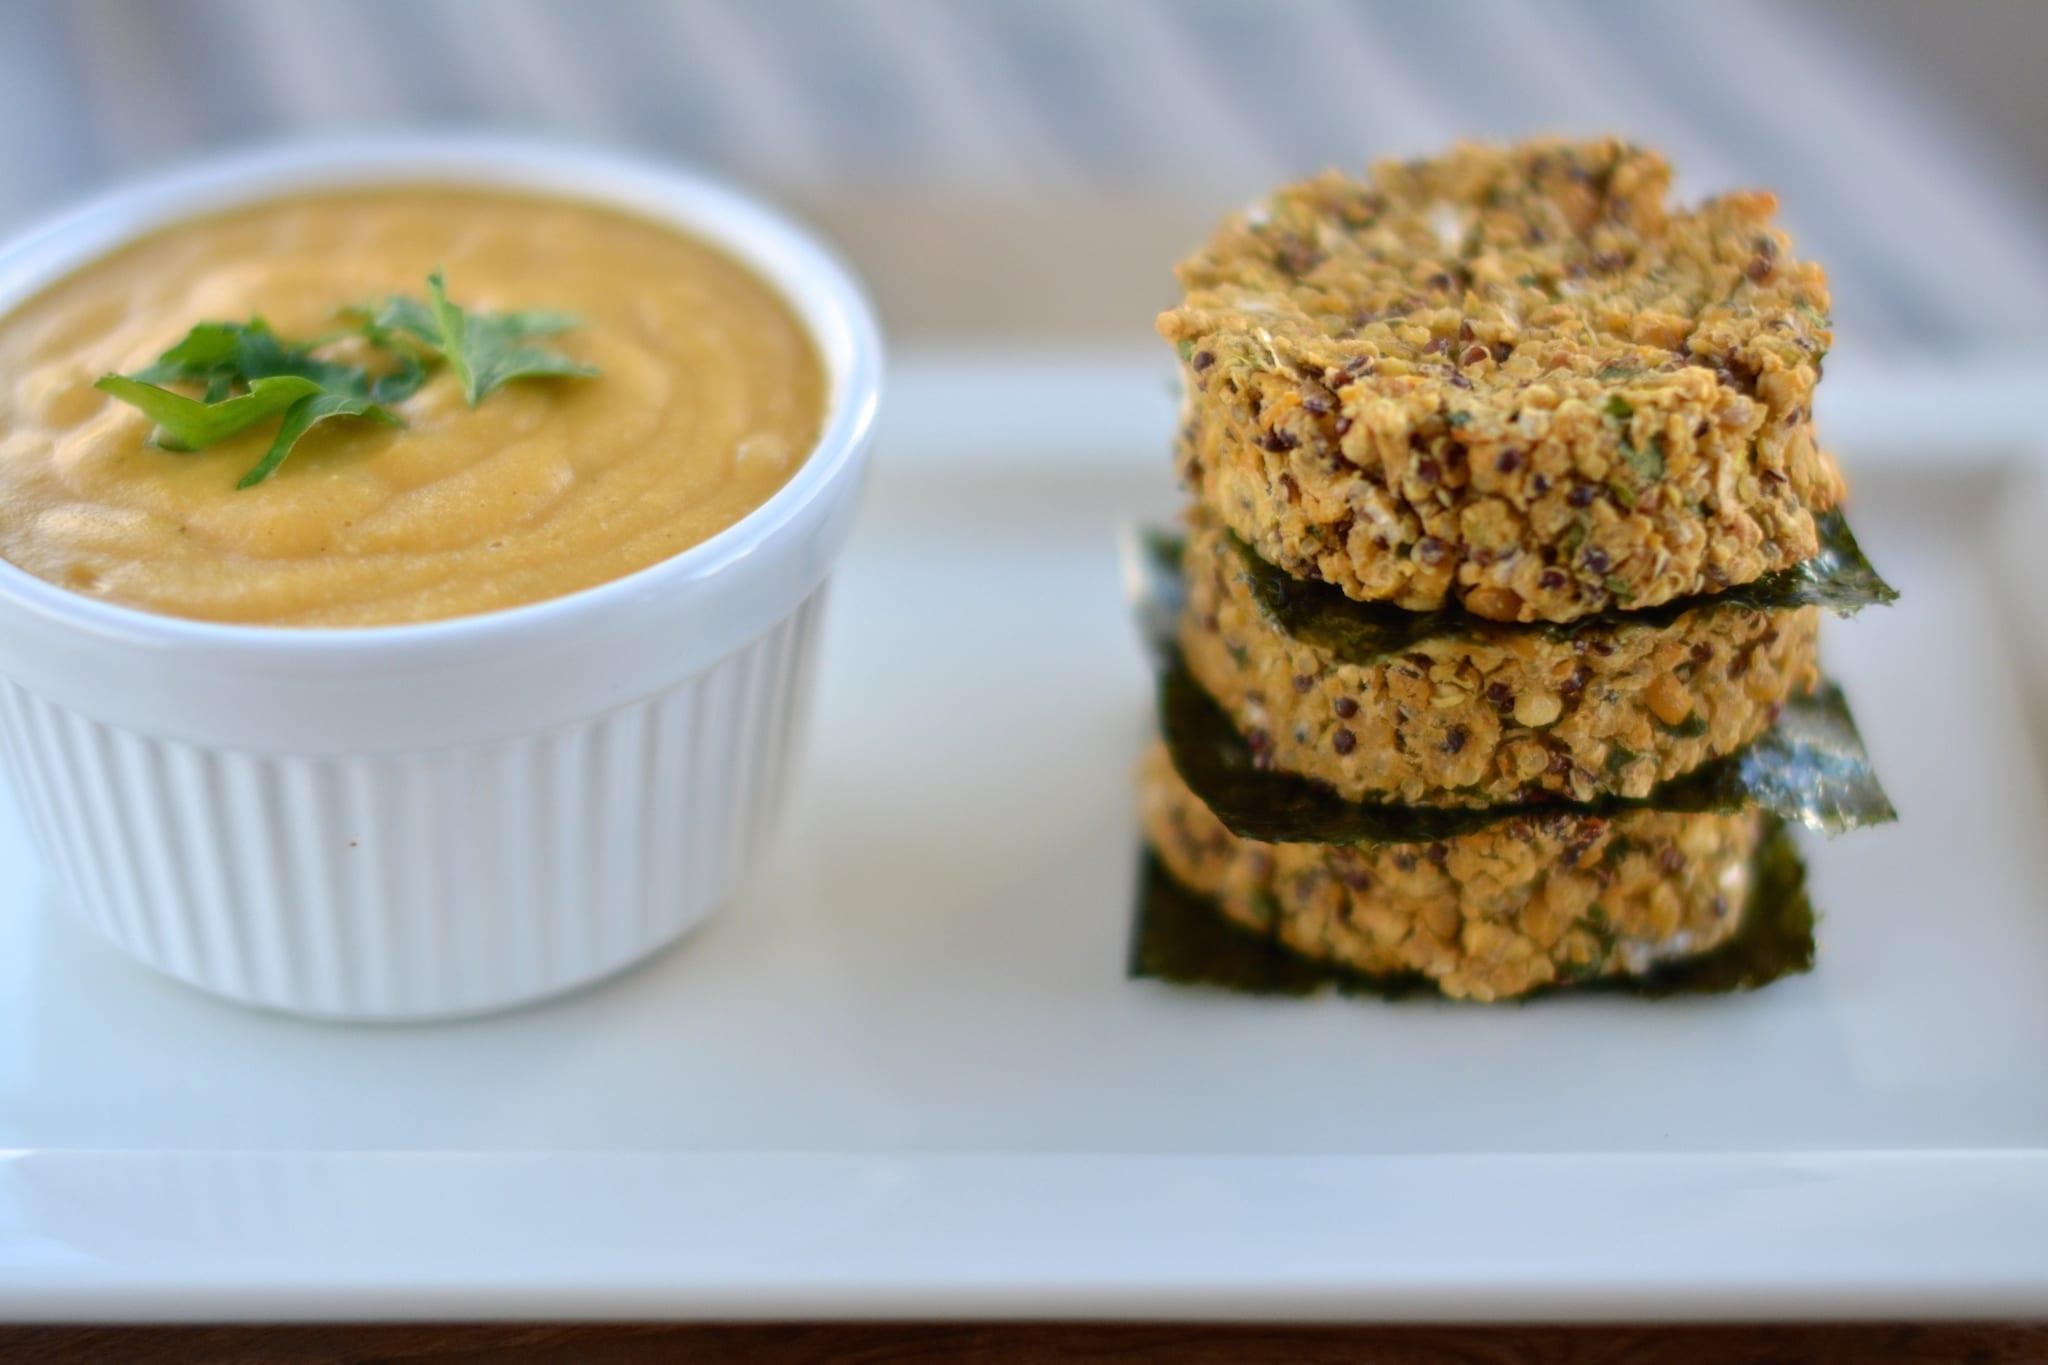 Chickpea-Quinoa Patties with Cheesy Vegan Sauce